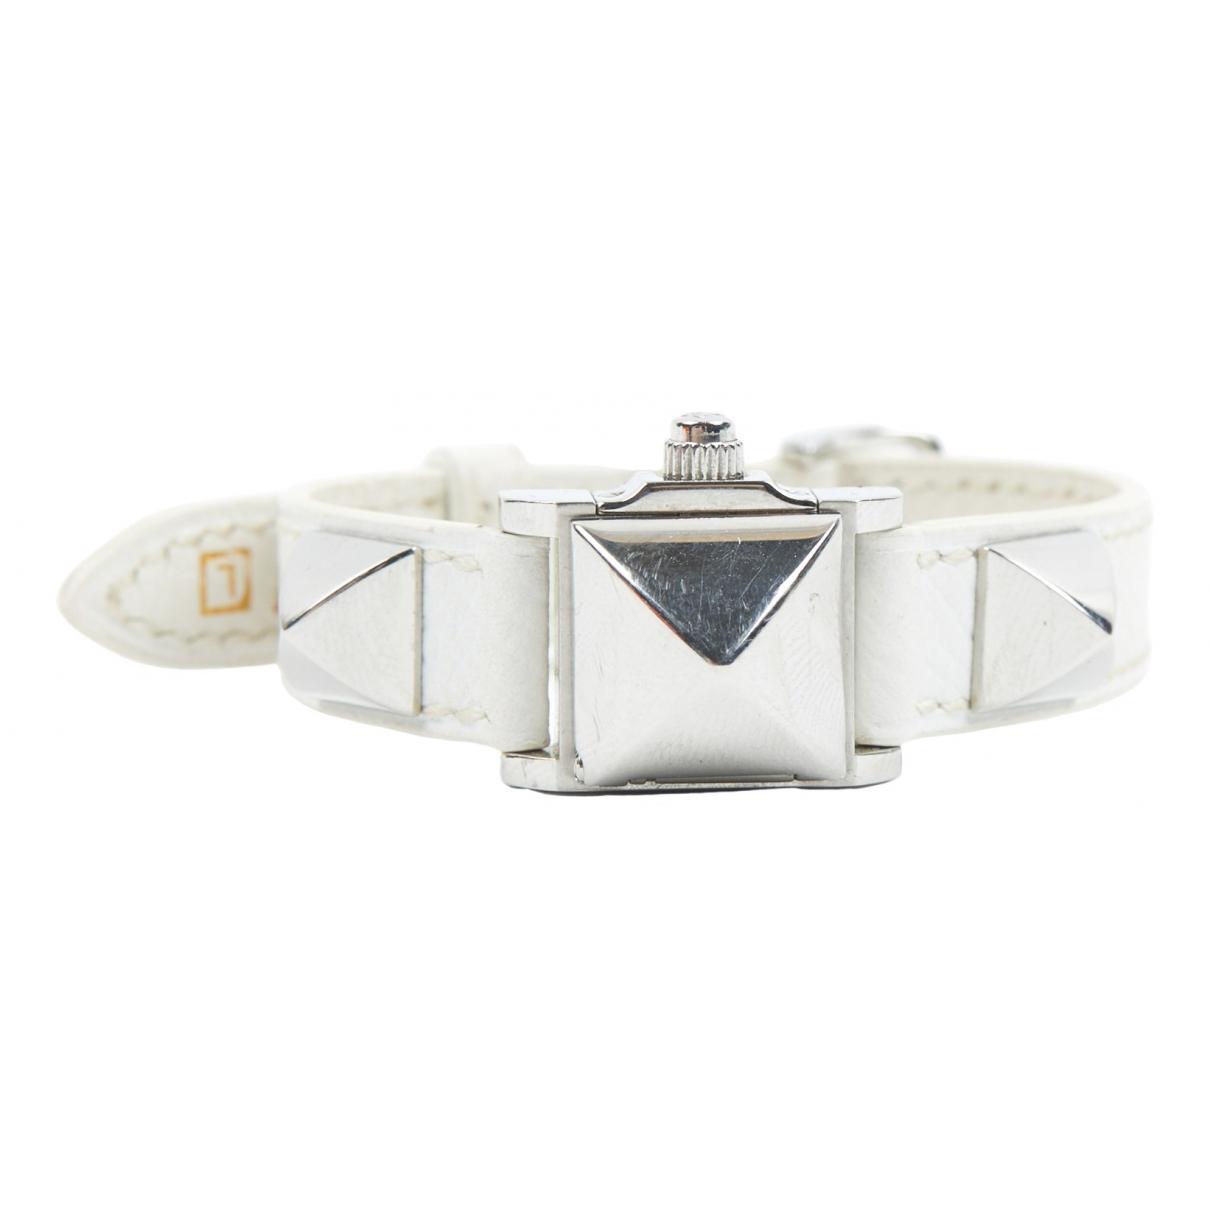 Hermes Medor Uhr in  Weiss Stahl